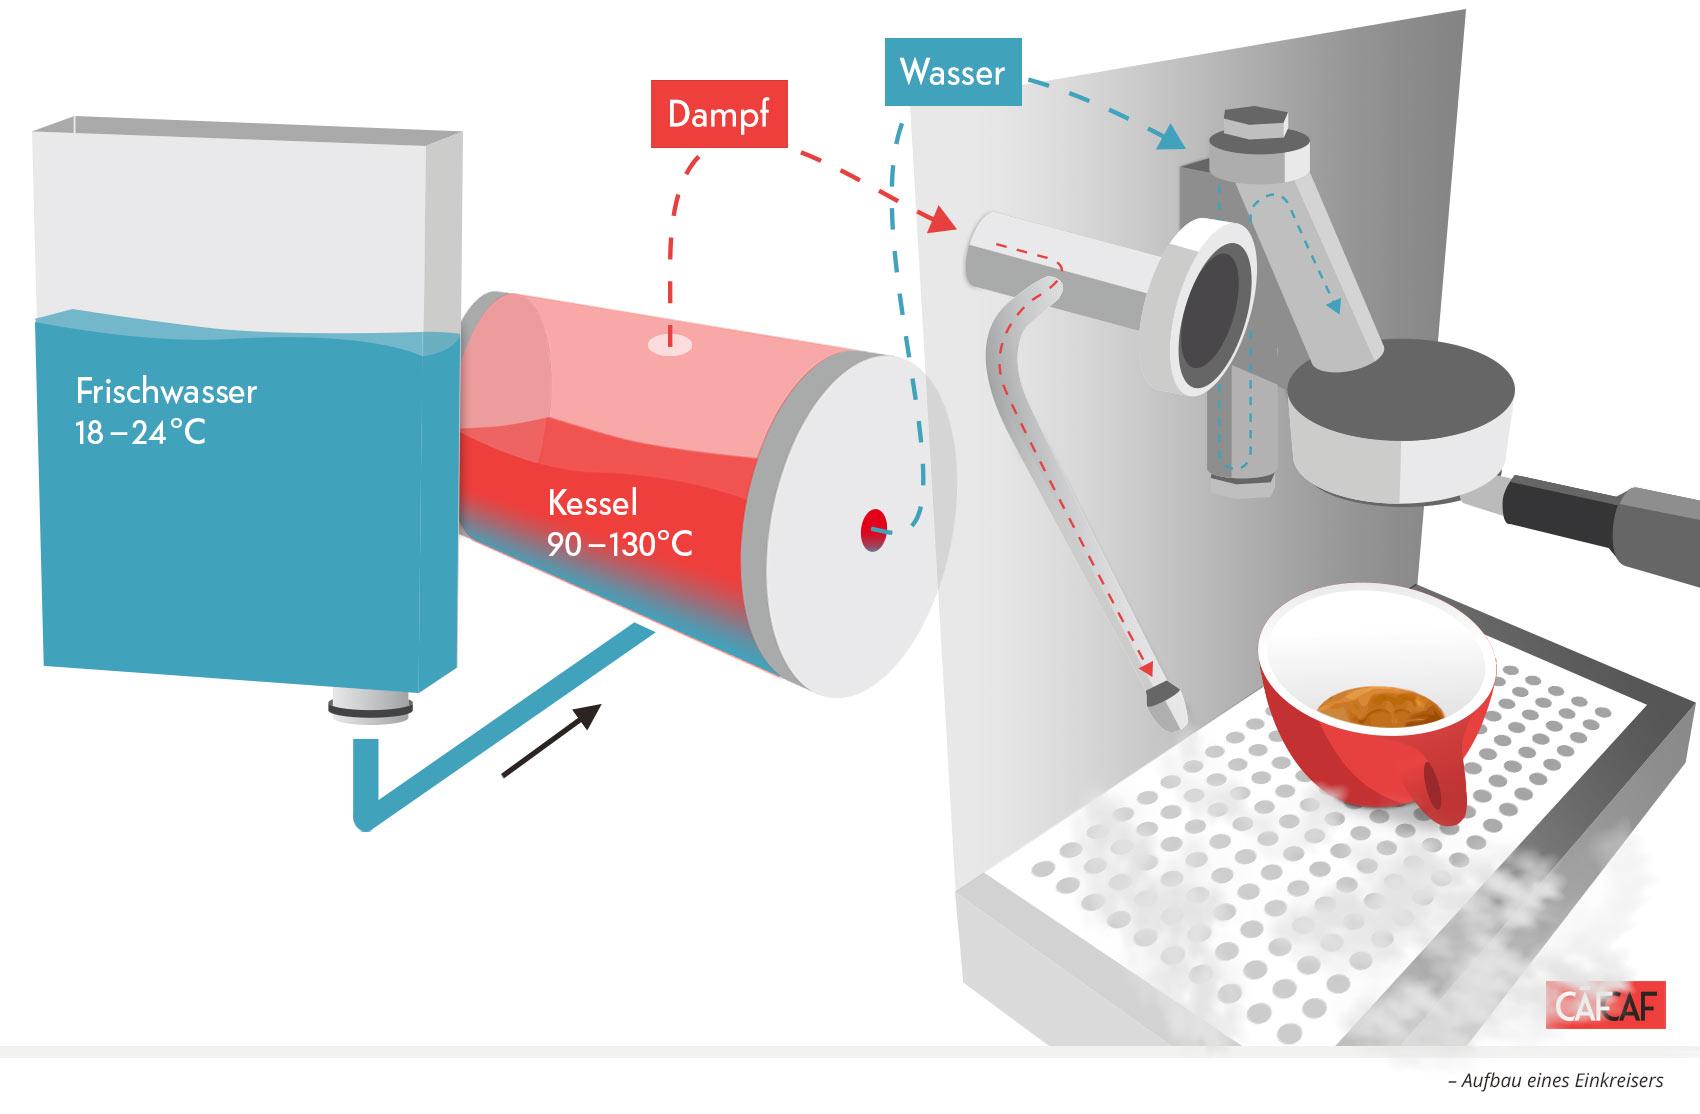 CafCaf Kaffee Blog, Kaffeeblog: Aufbau Einkreiser, Schaubild